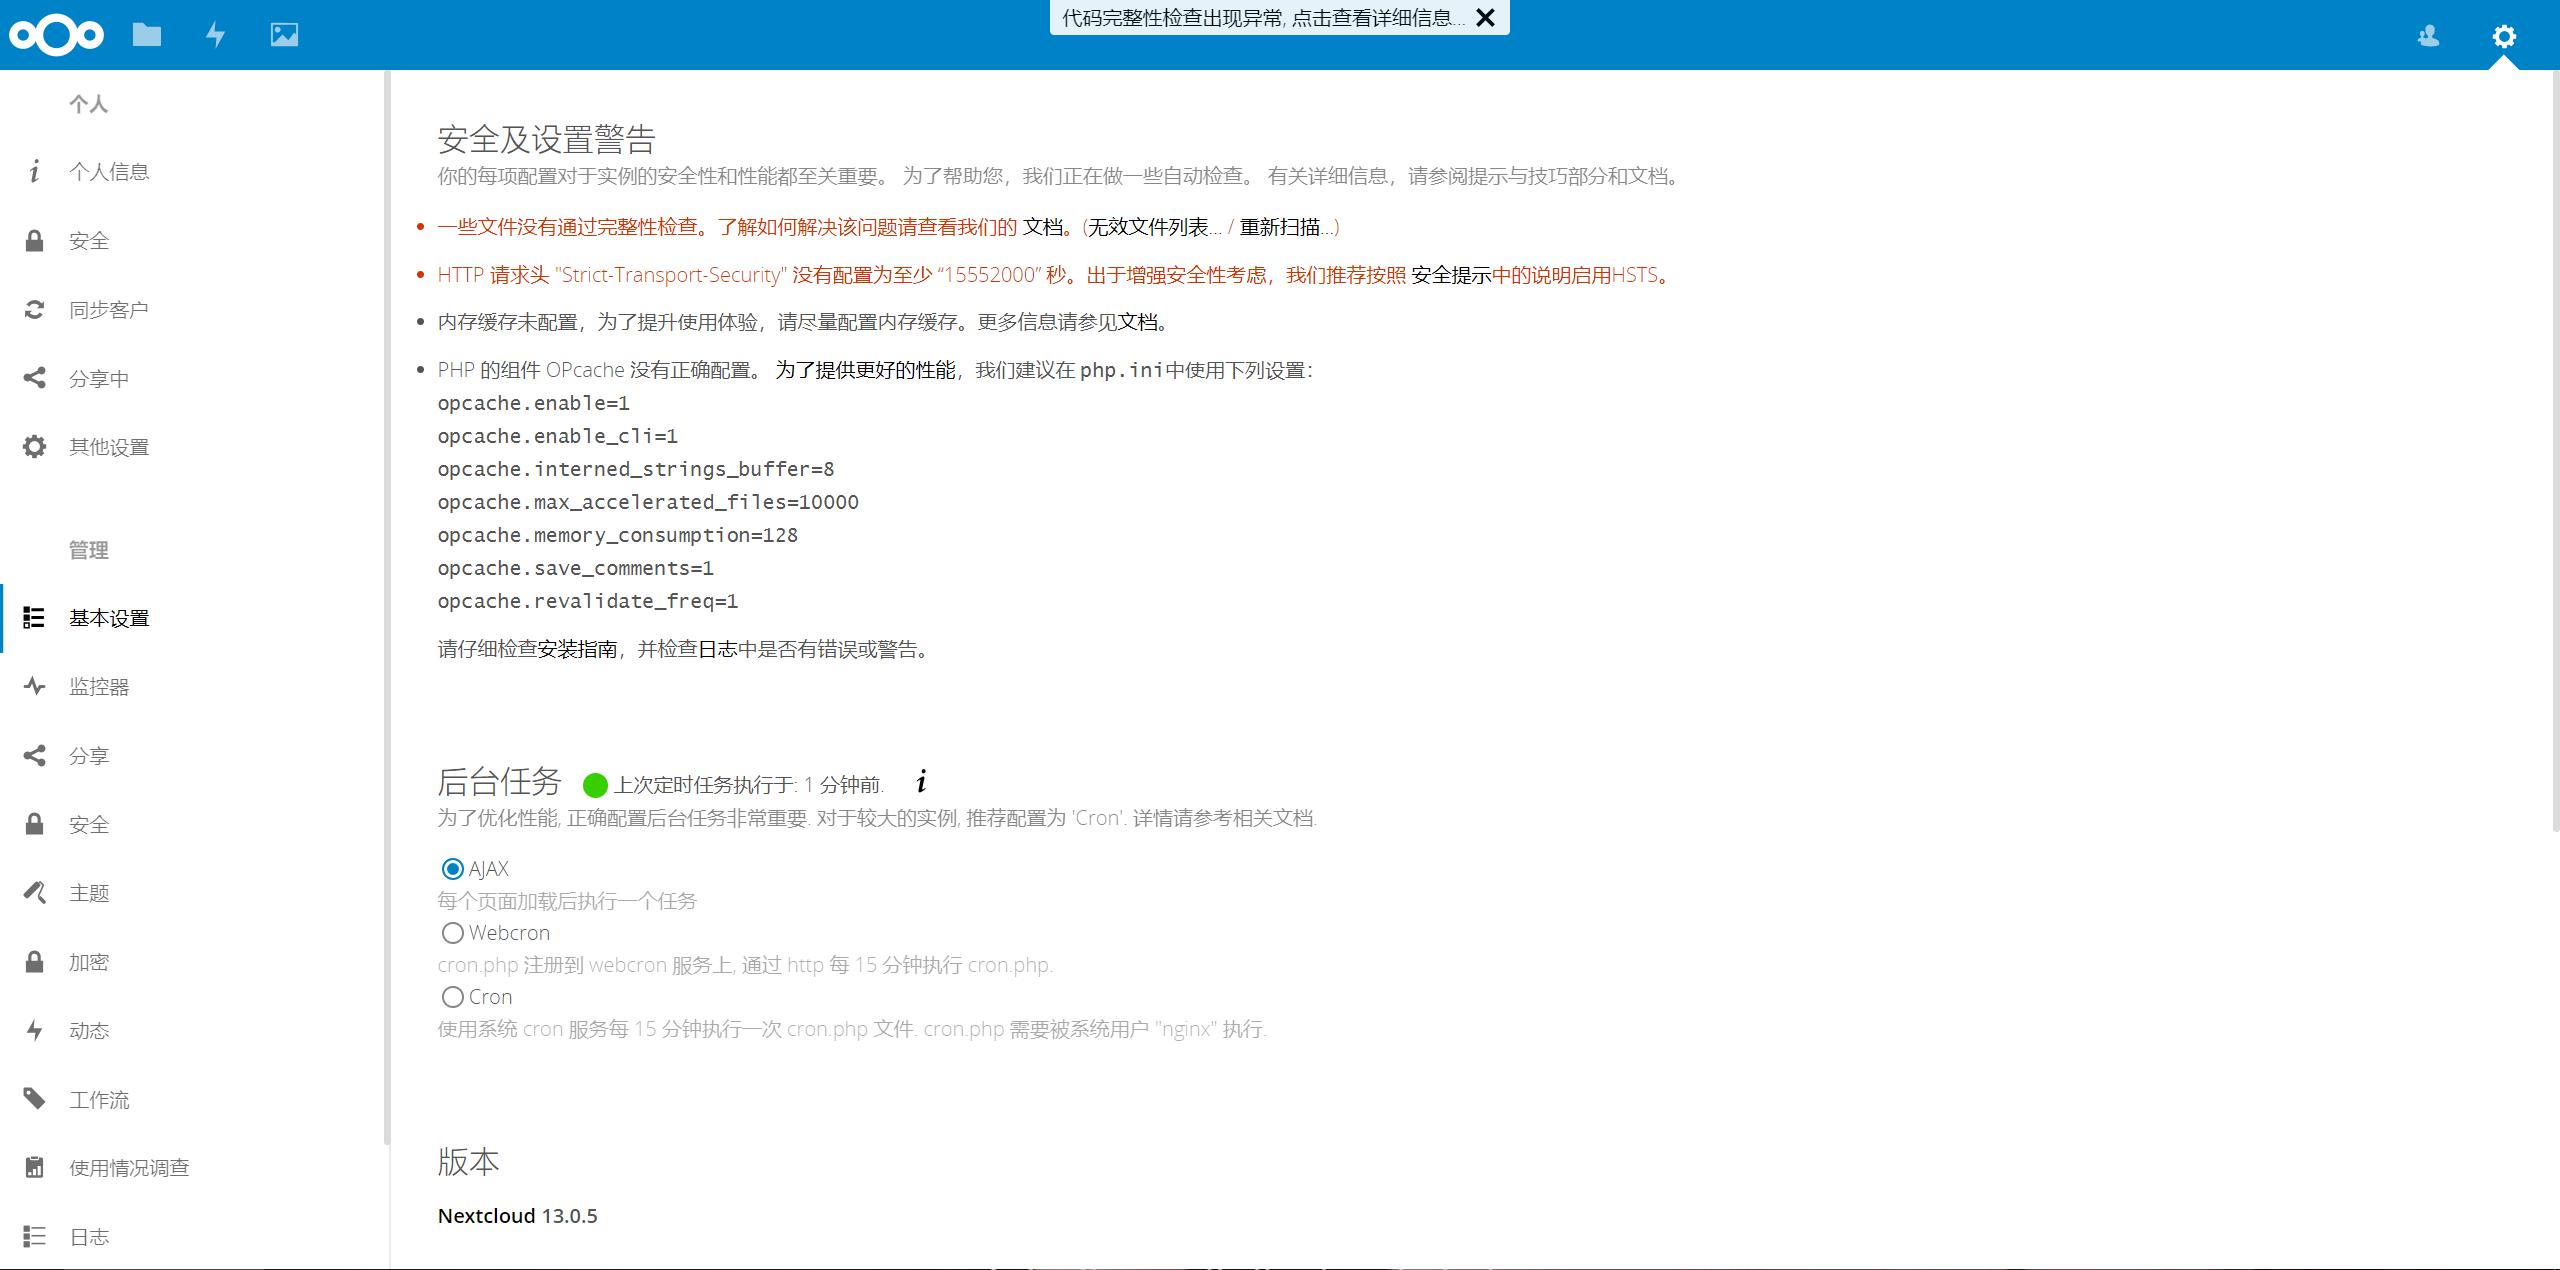 nextcloud错误列表.png